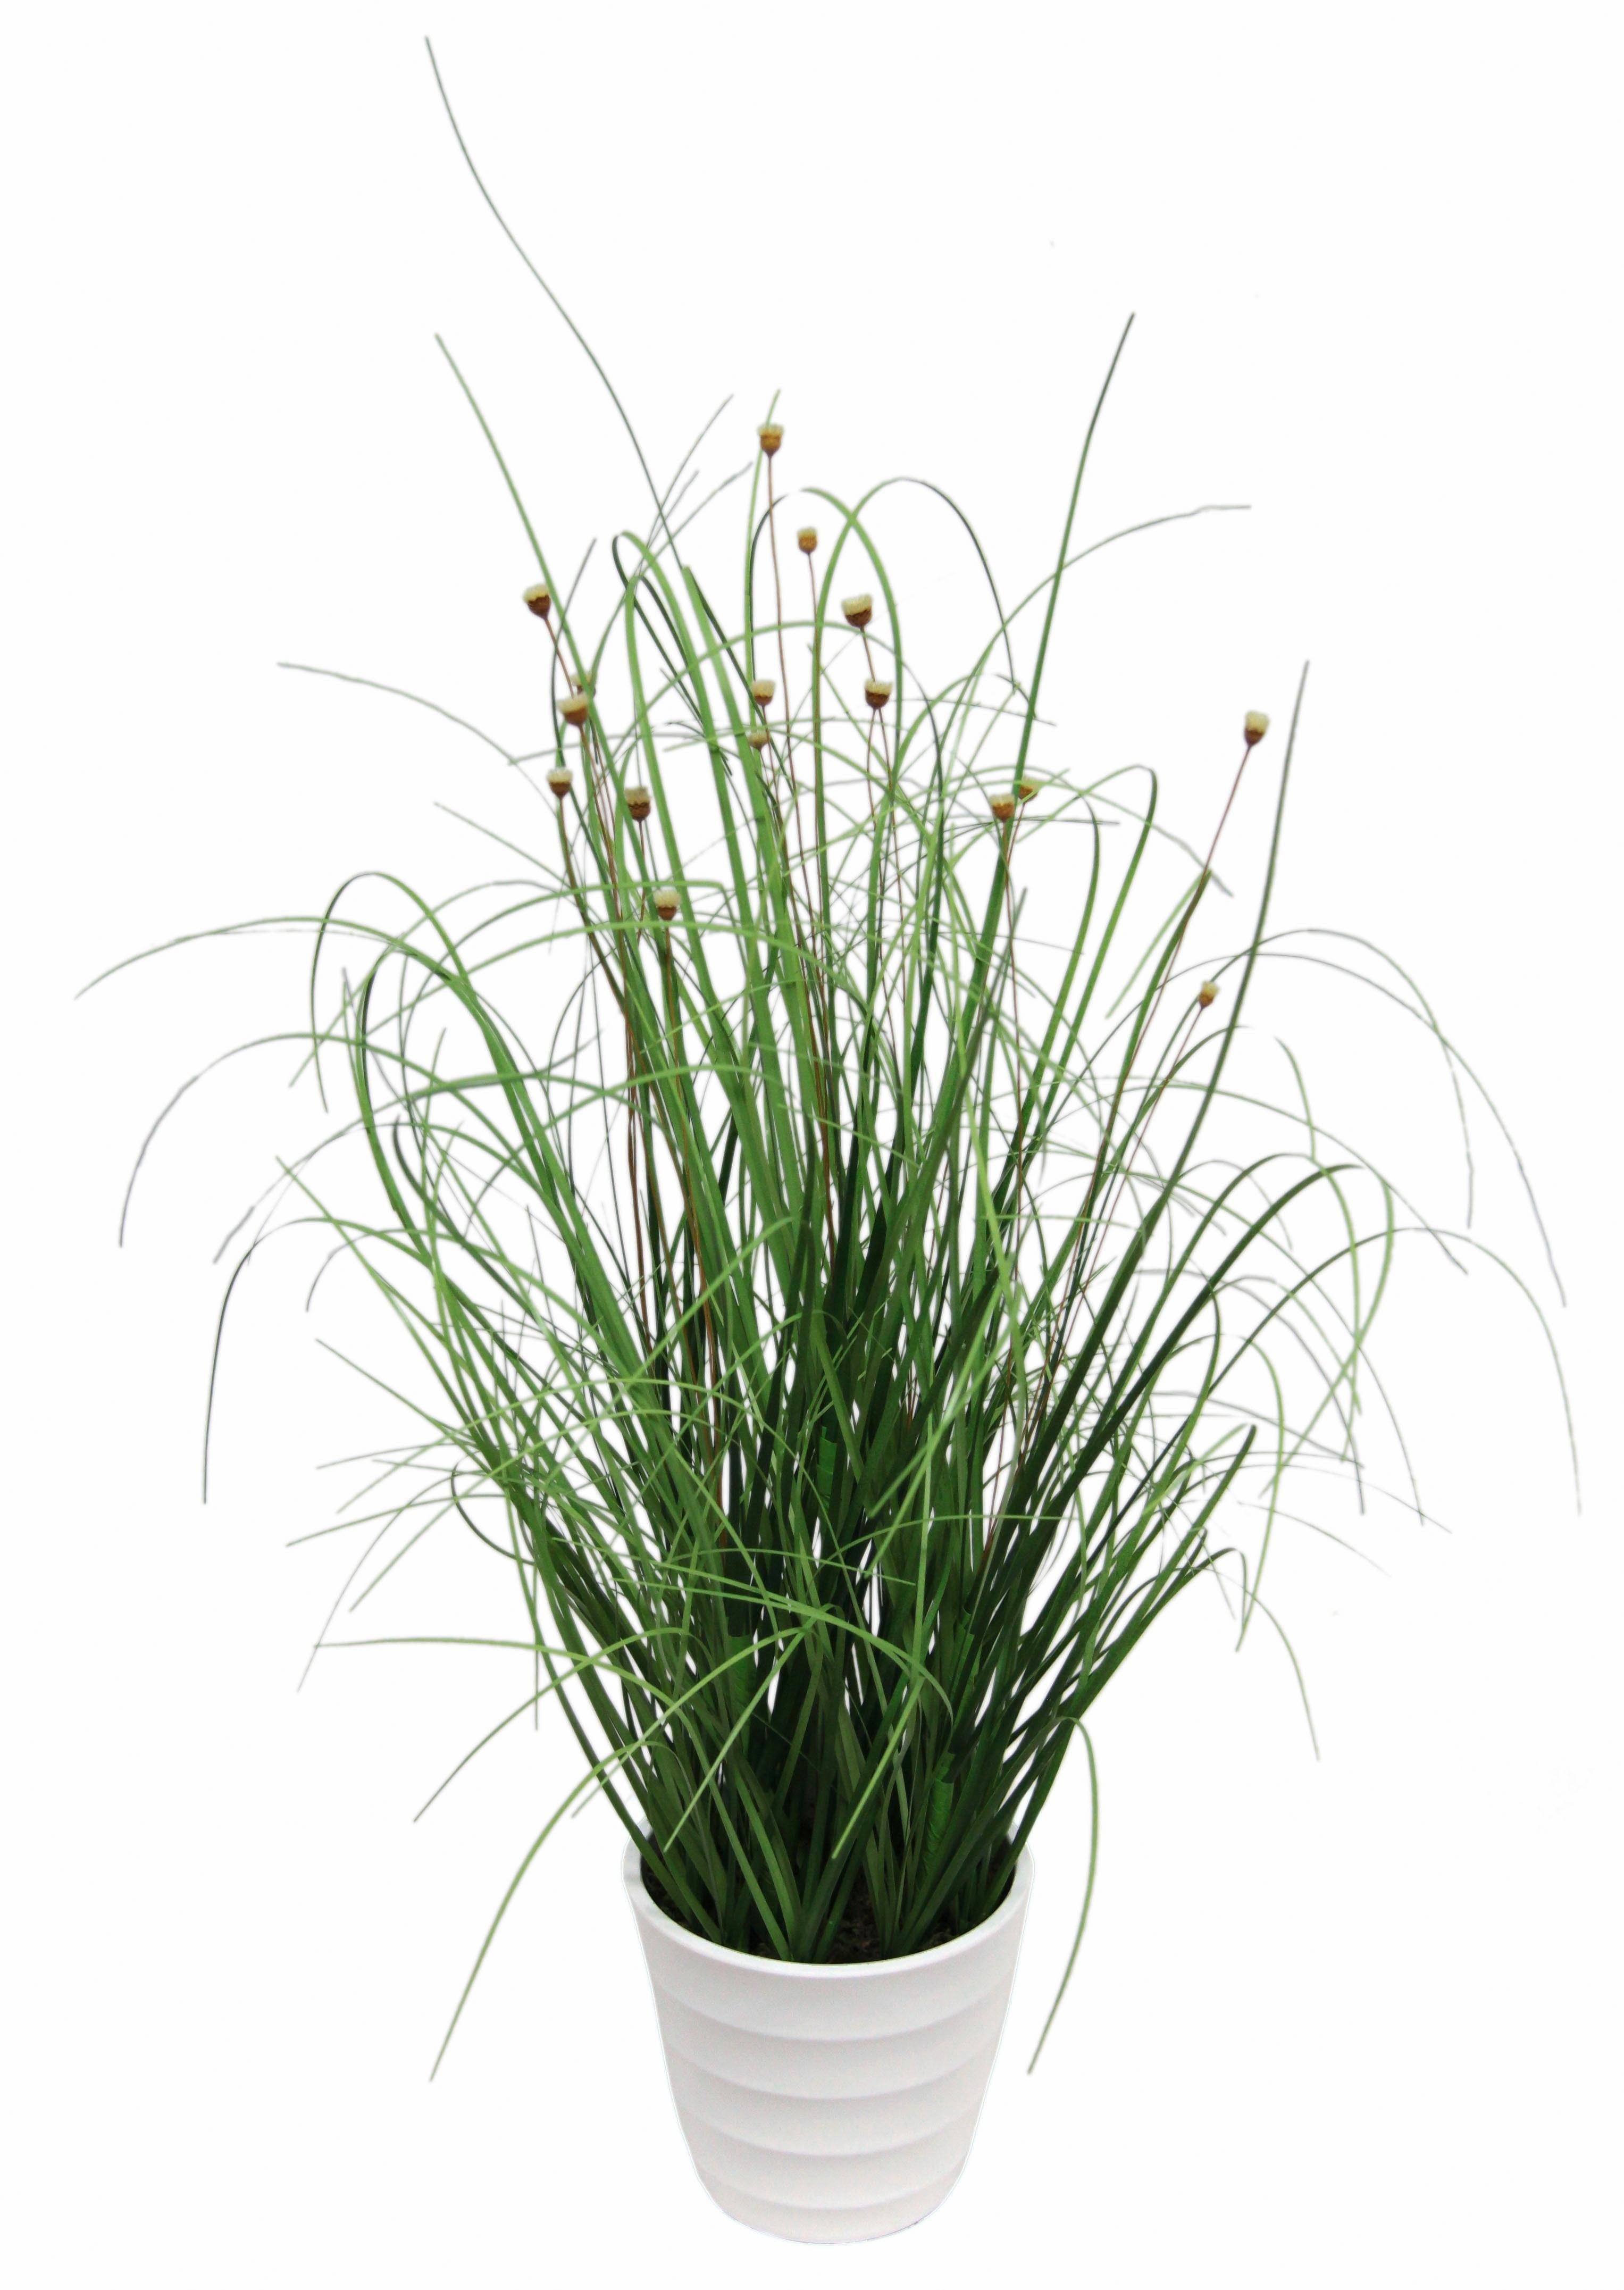 Home affaire Kunstpflanze »Grasbusch« im Topf